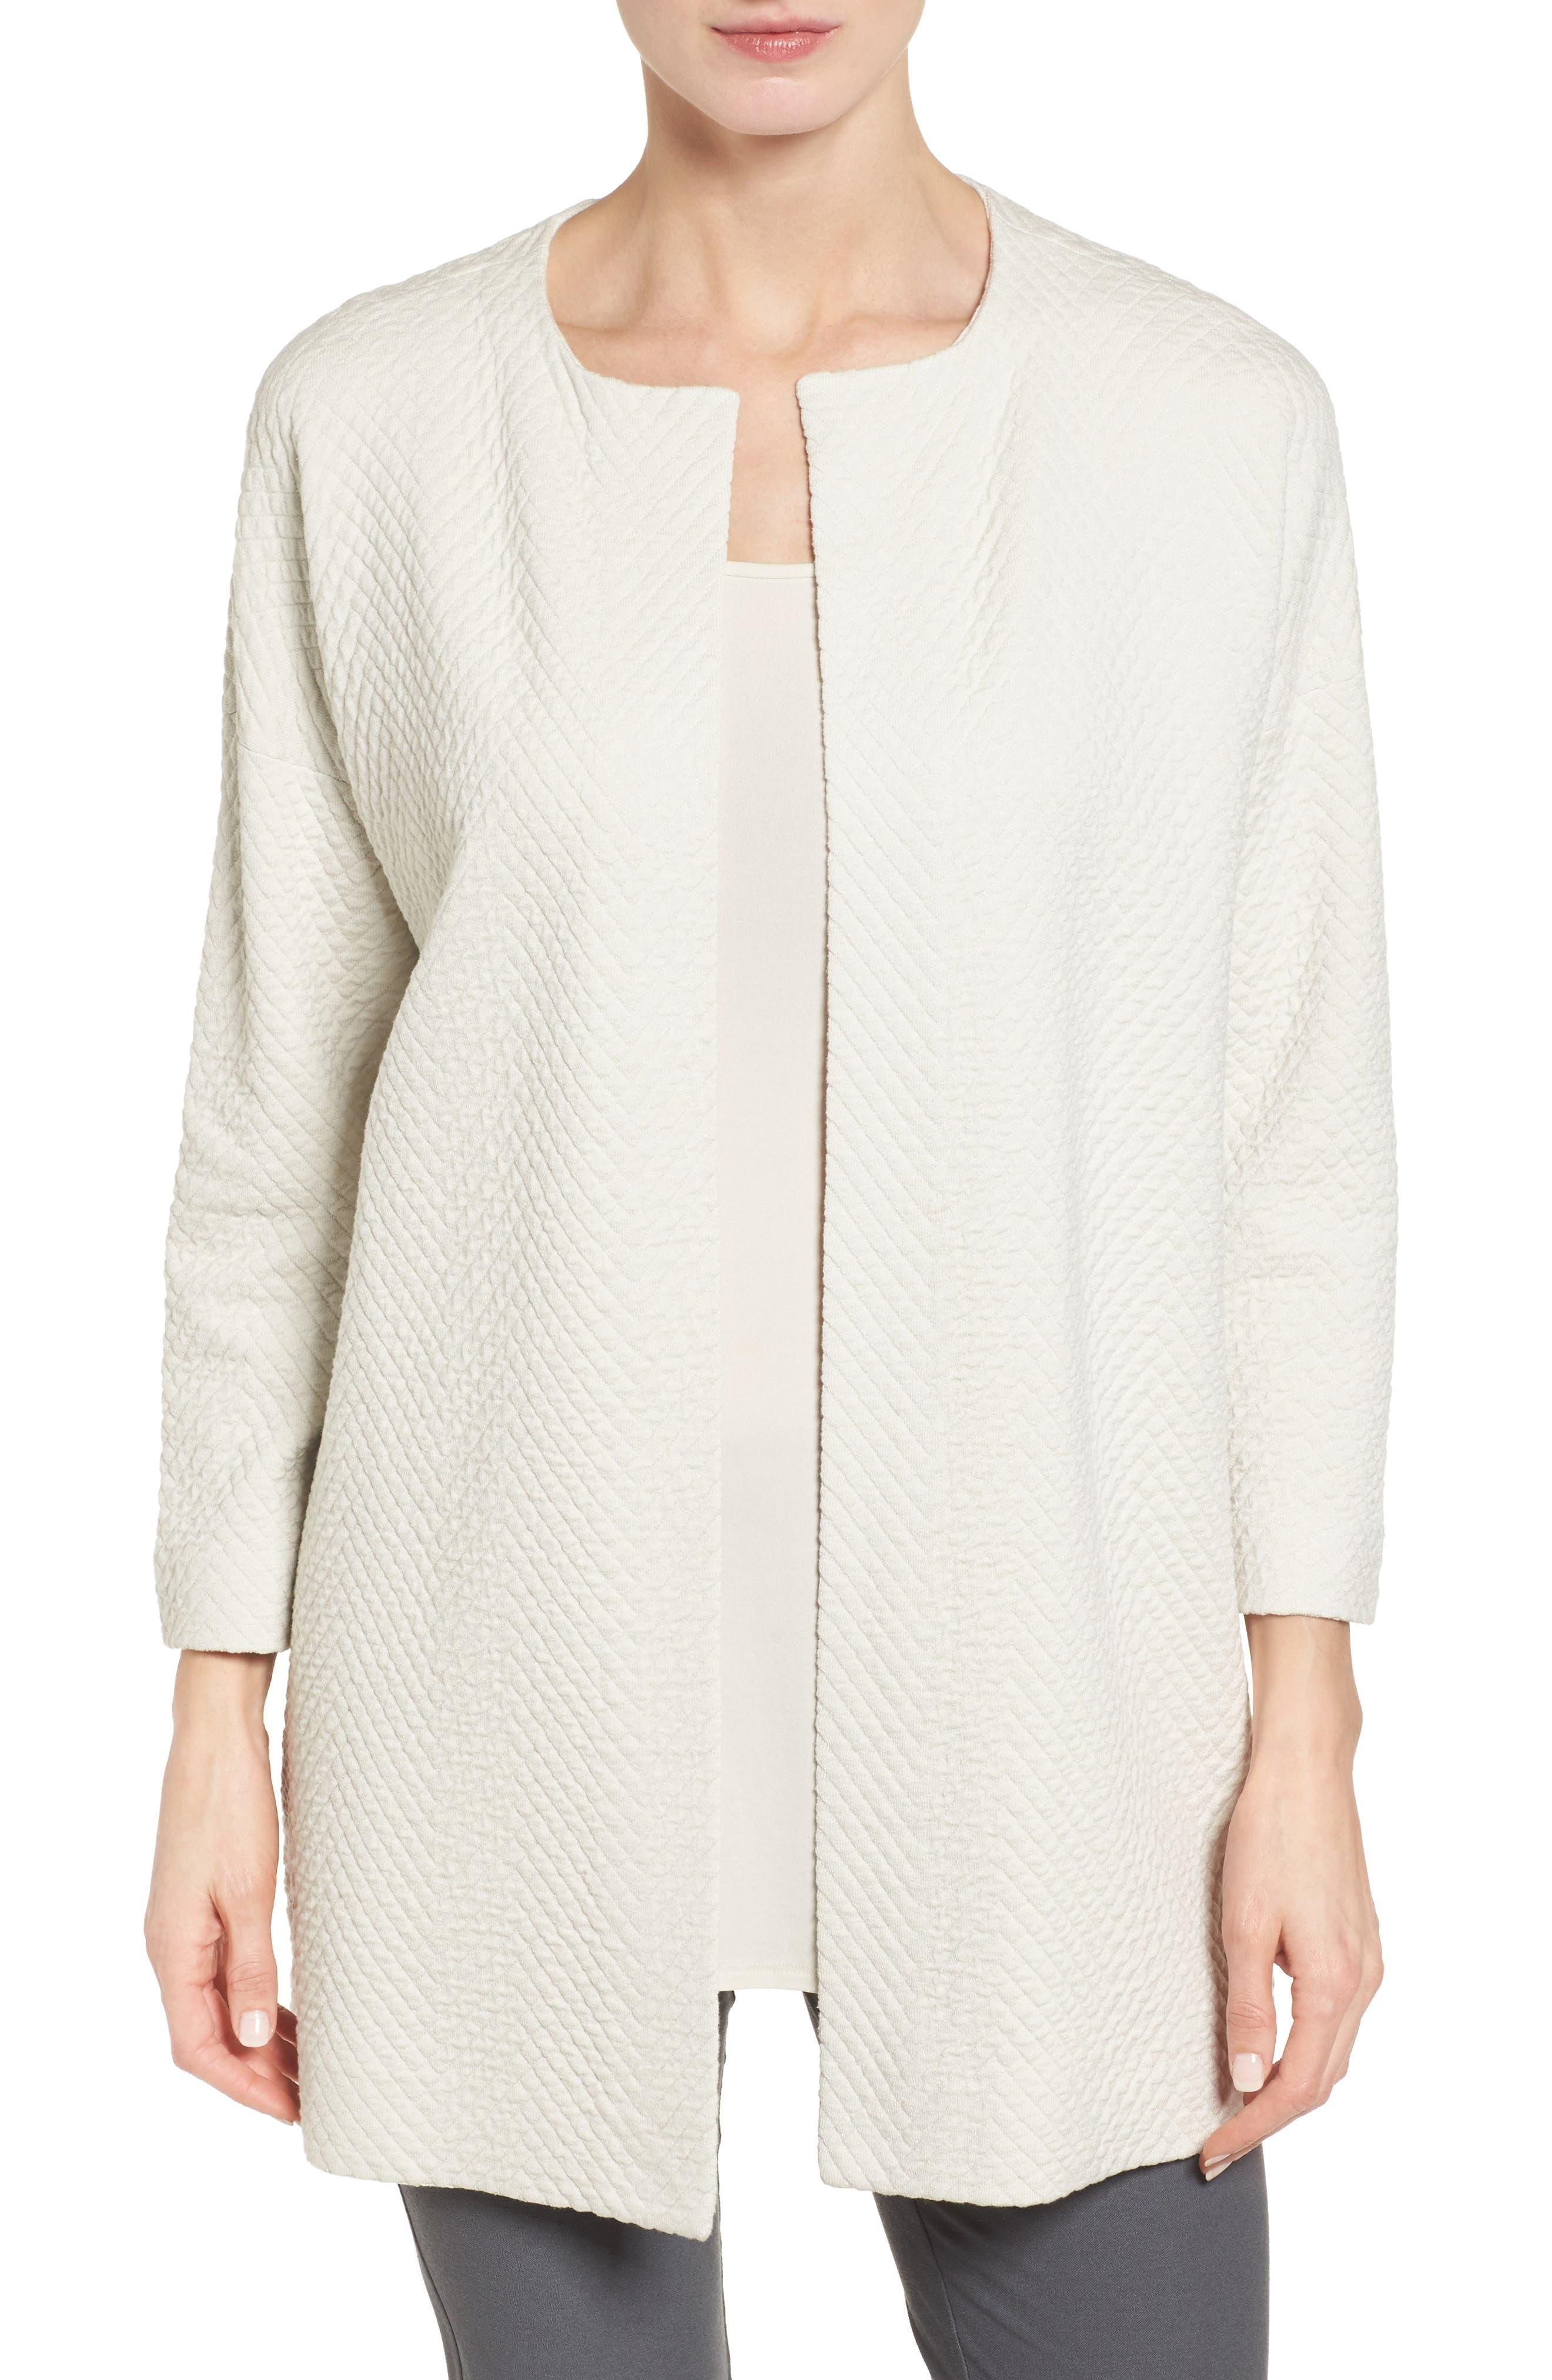 Silk Blend Jacquard Jacket, Main, color, 100